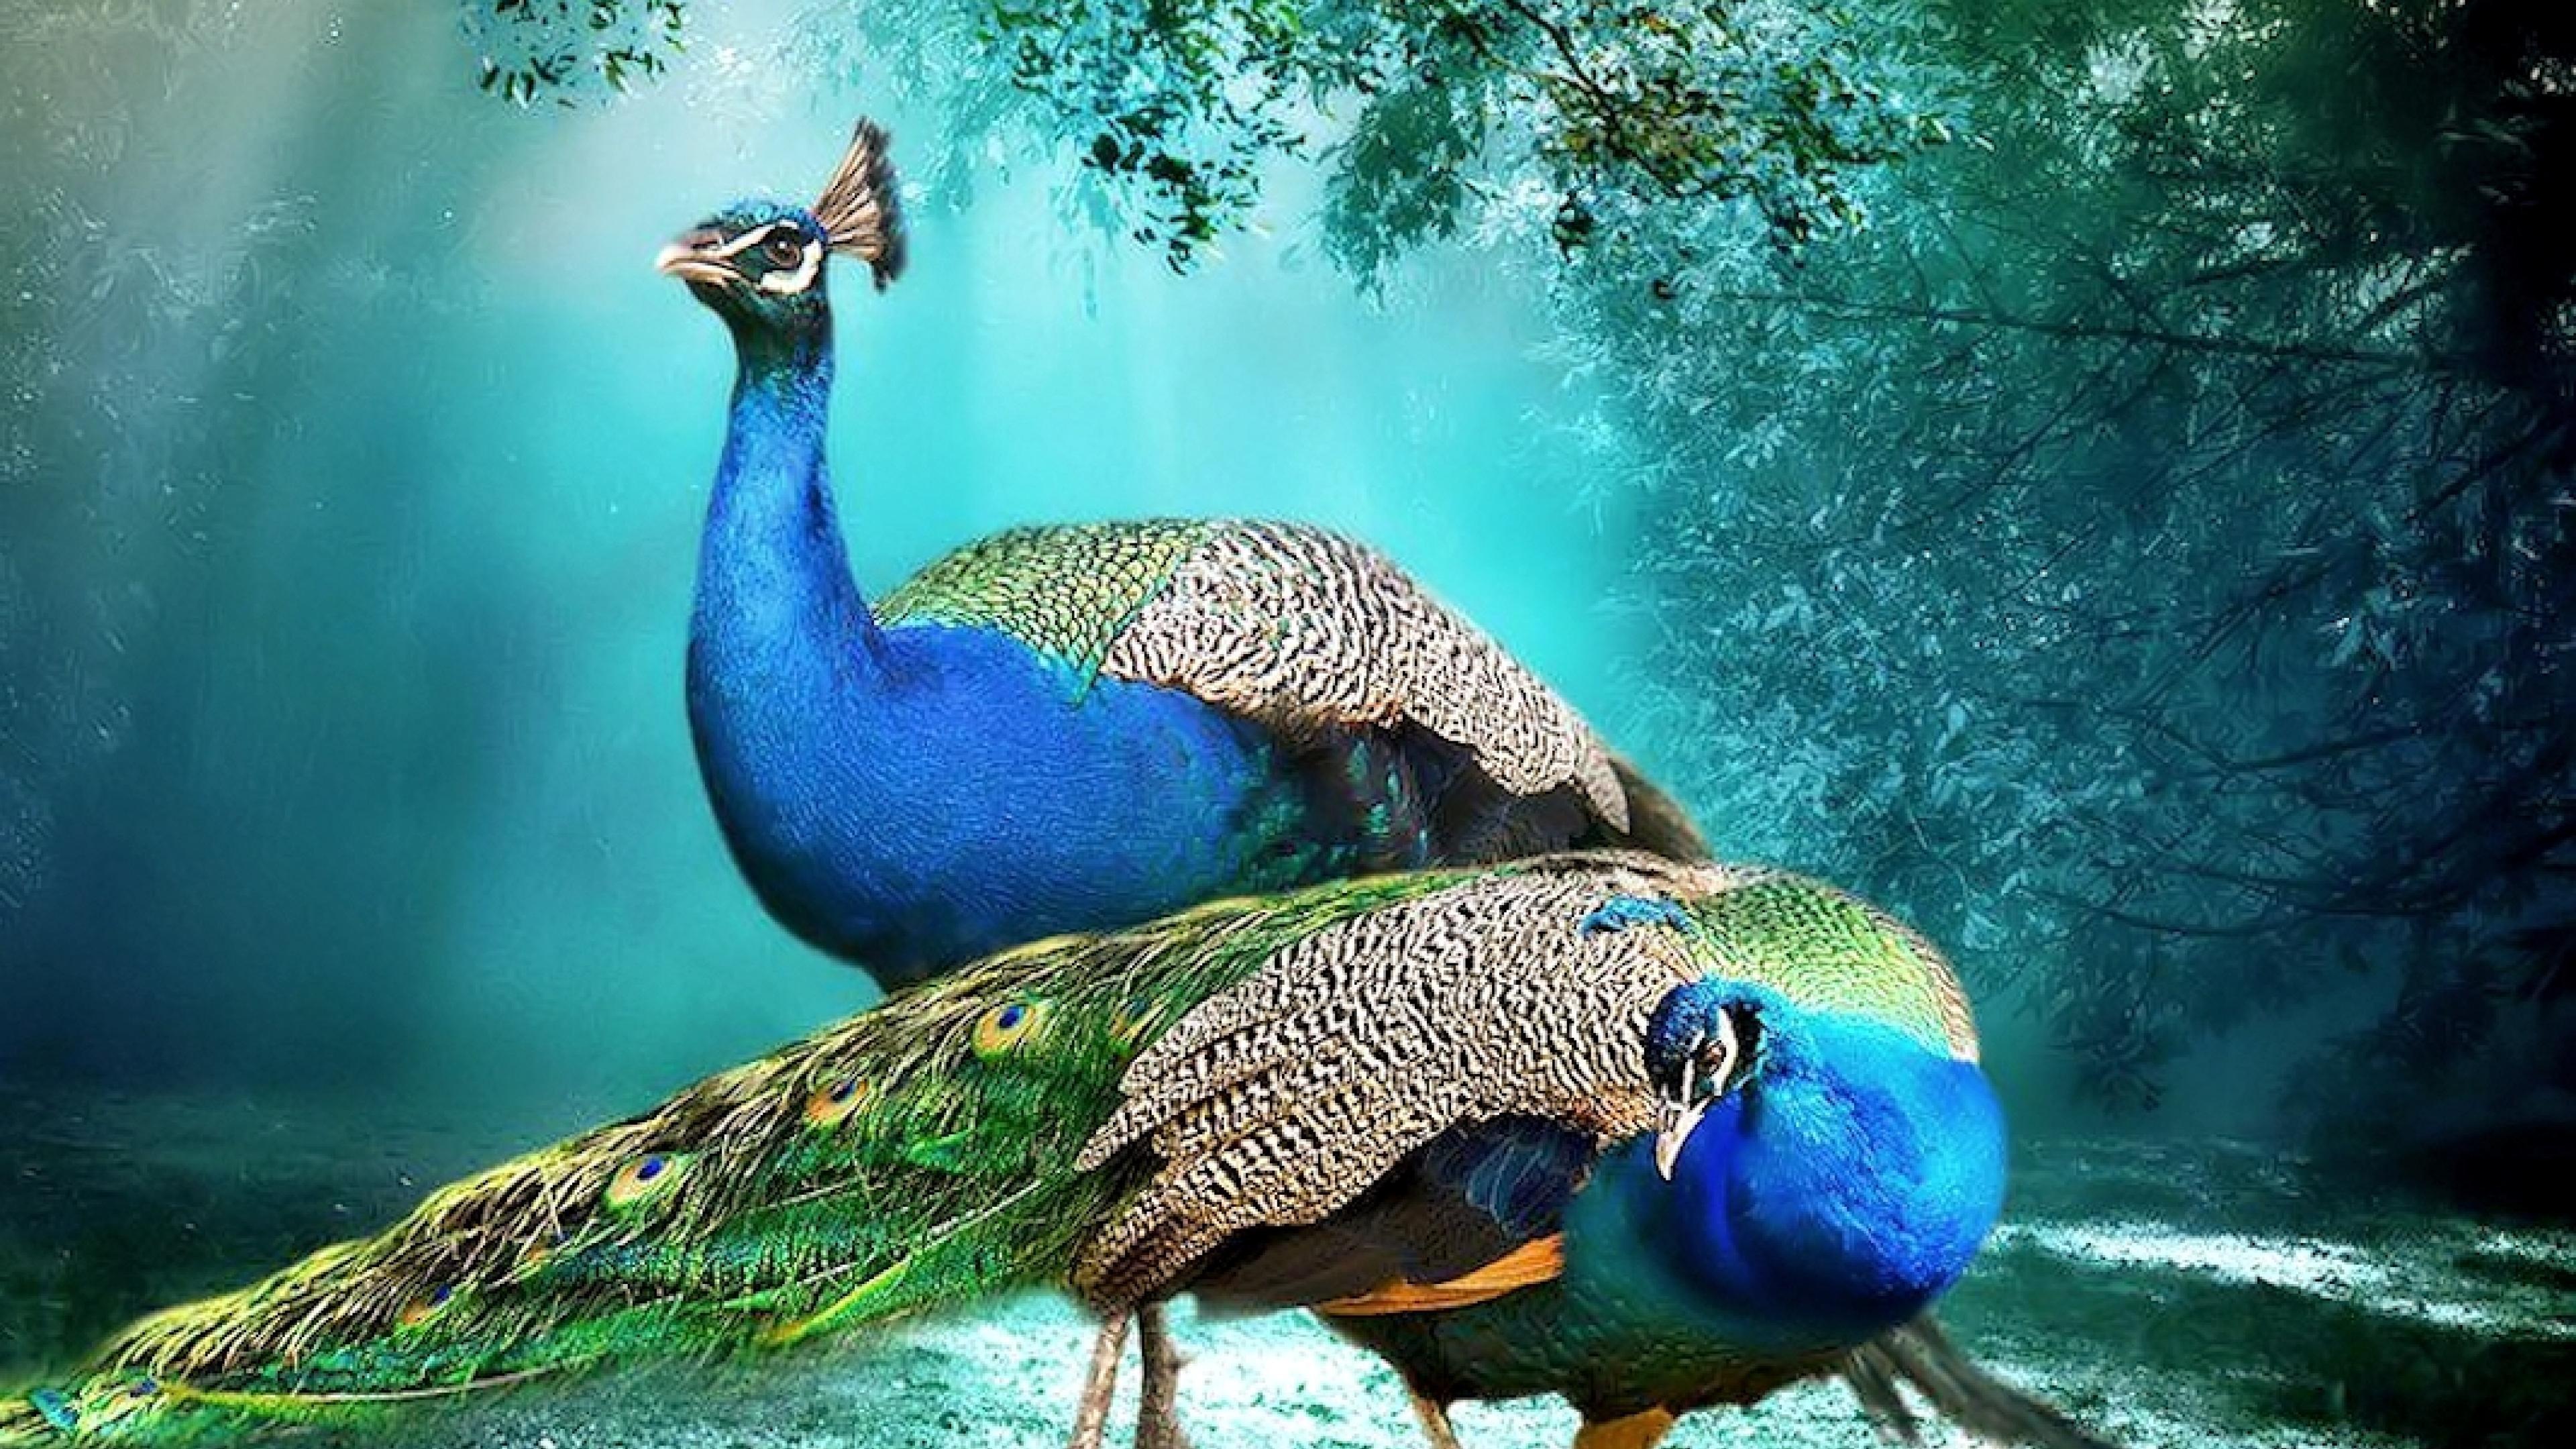 Wallpaper Peacock (63+ Images